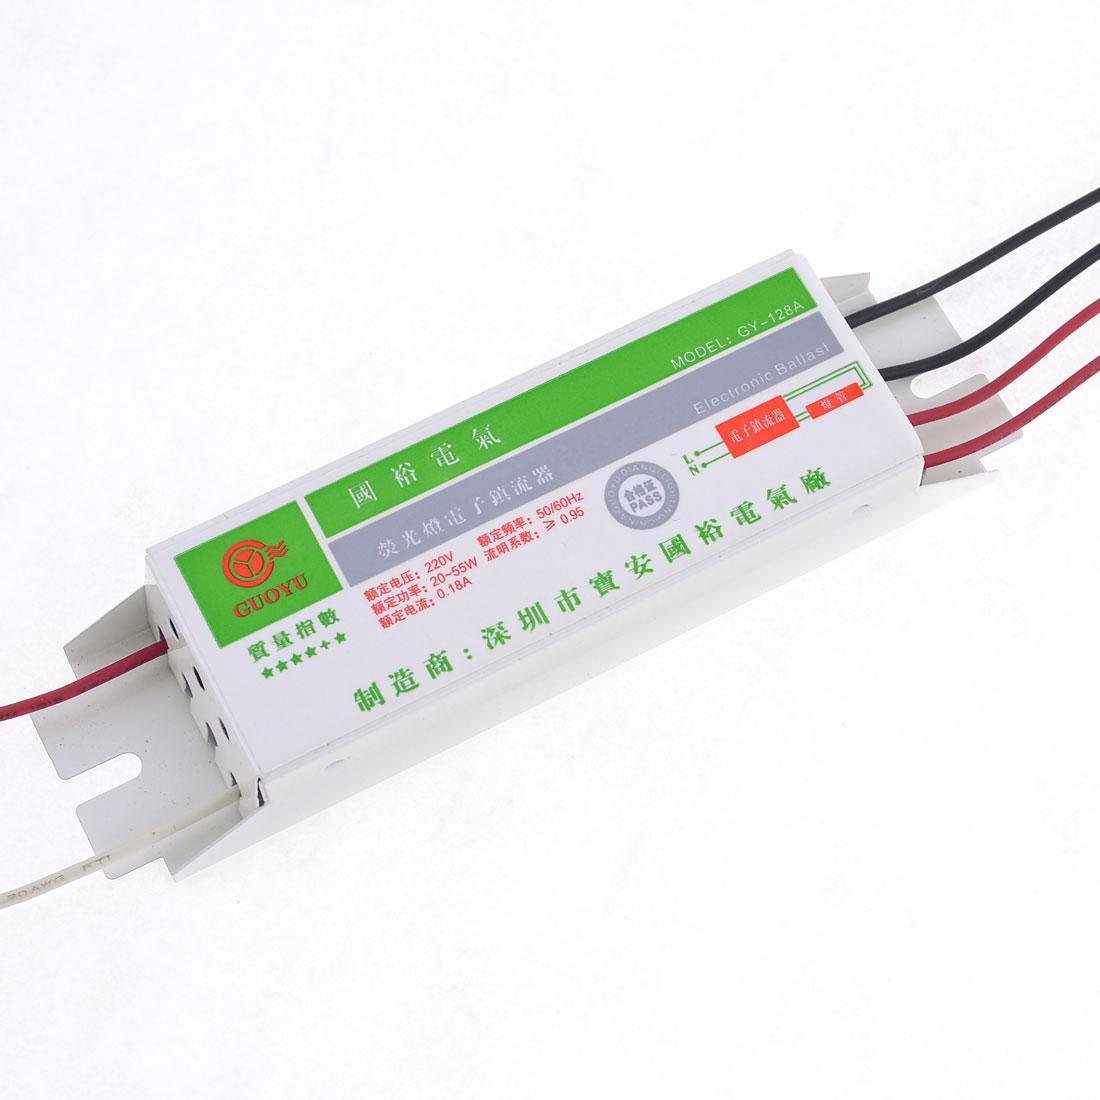 20-55W Metal Shell Fluorescent Light Lamp Ballast 220VAC